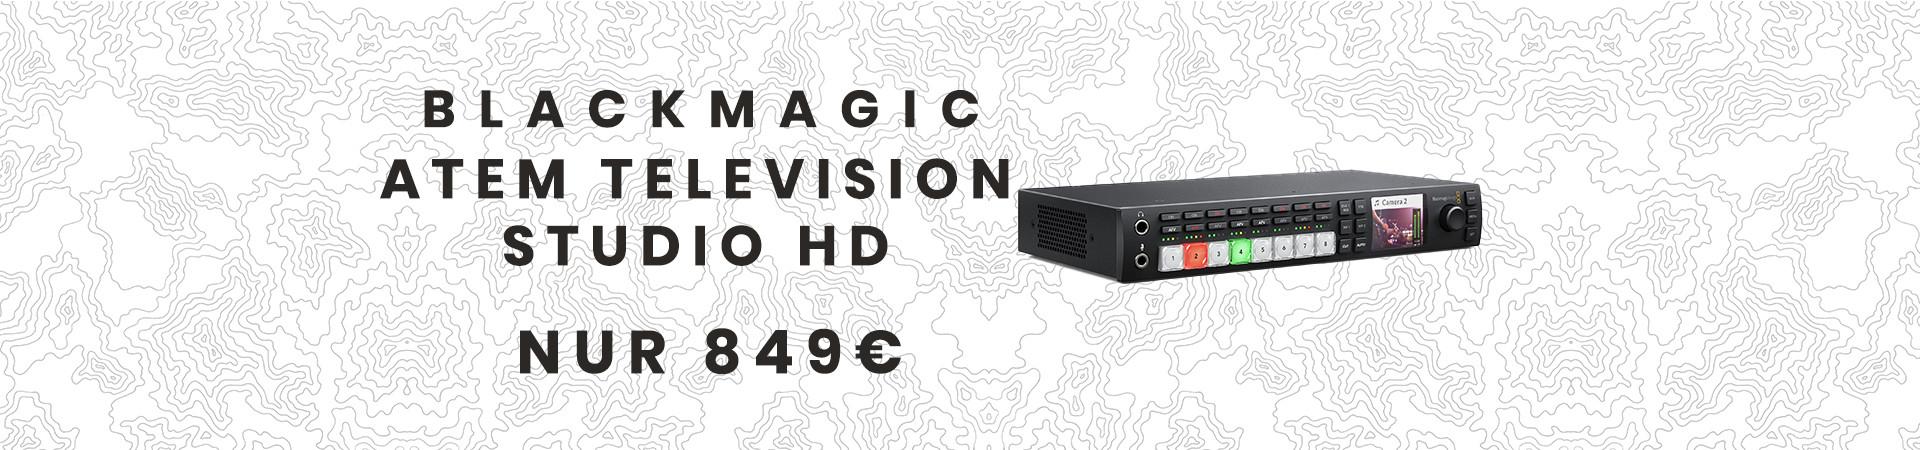 blm-atem-television-studioHD.jpg